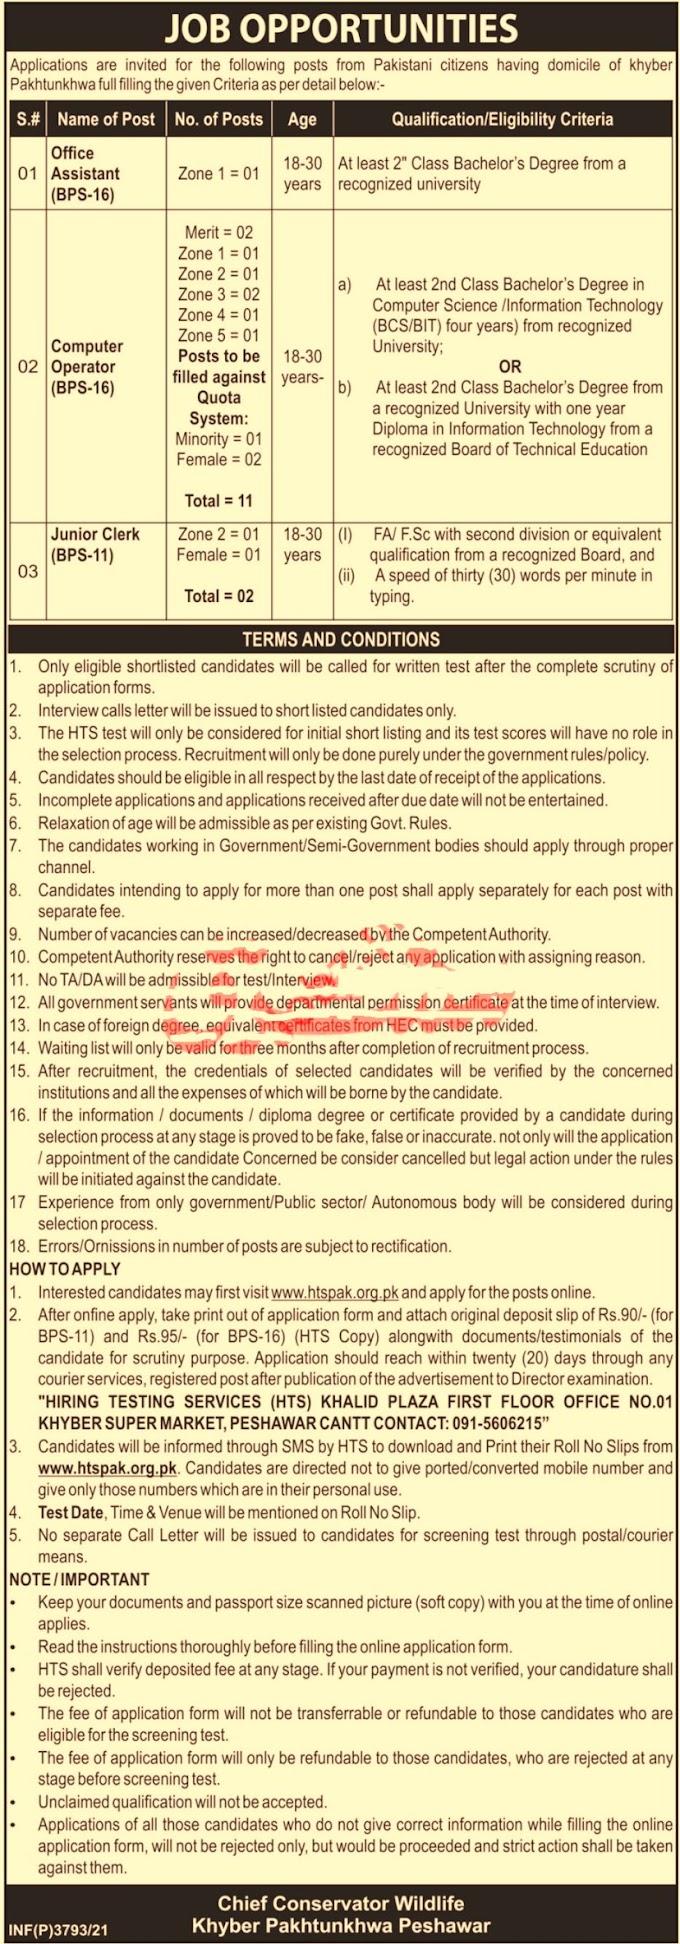 Forest & Wildlife Department KPK Jobs 2021 Office Assistant, Public Sector Organization Peshawar Jobs 2021 peshawar, Forest & Wildlife Department KPK Jobs 2021,govt jobs, latest jobs kpk,